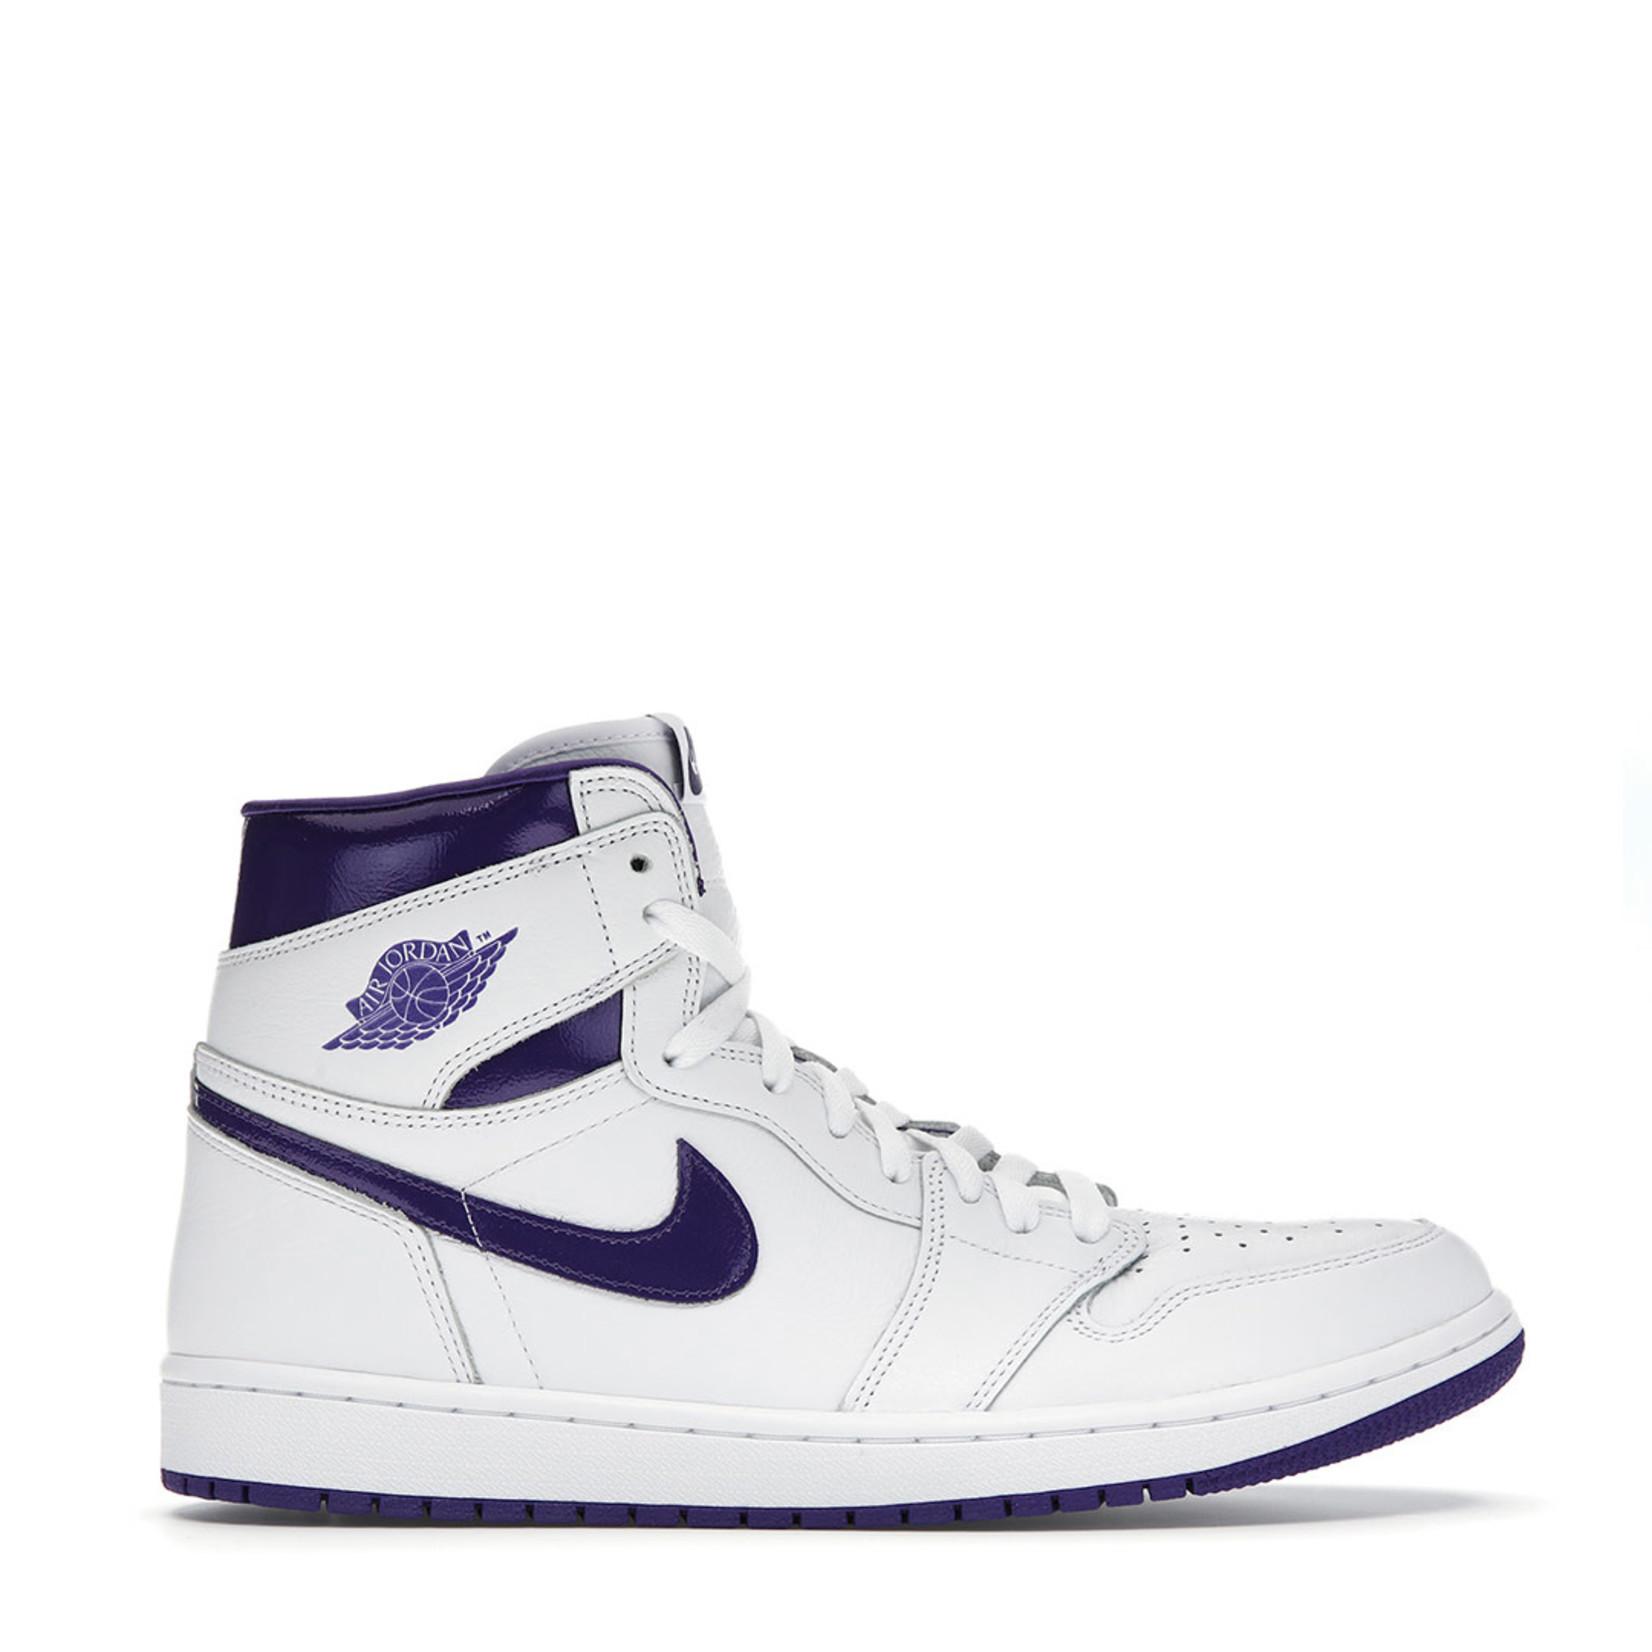 Jordan Jordan 1 Retro High Court Purple (W)